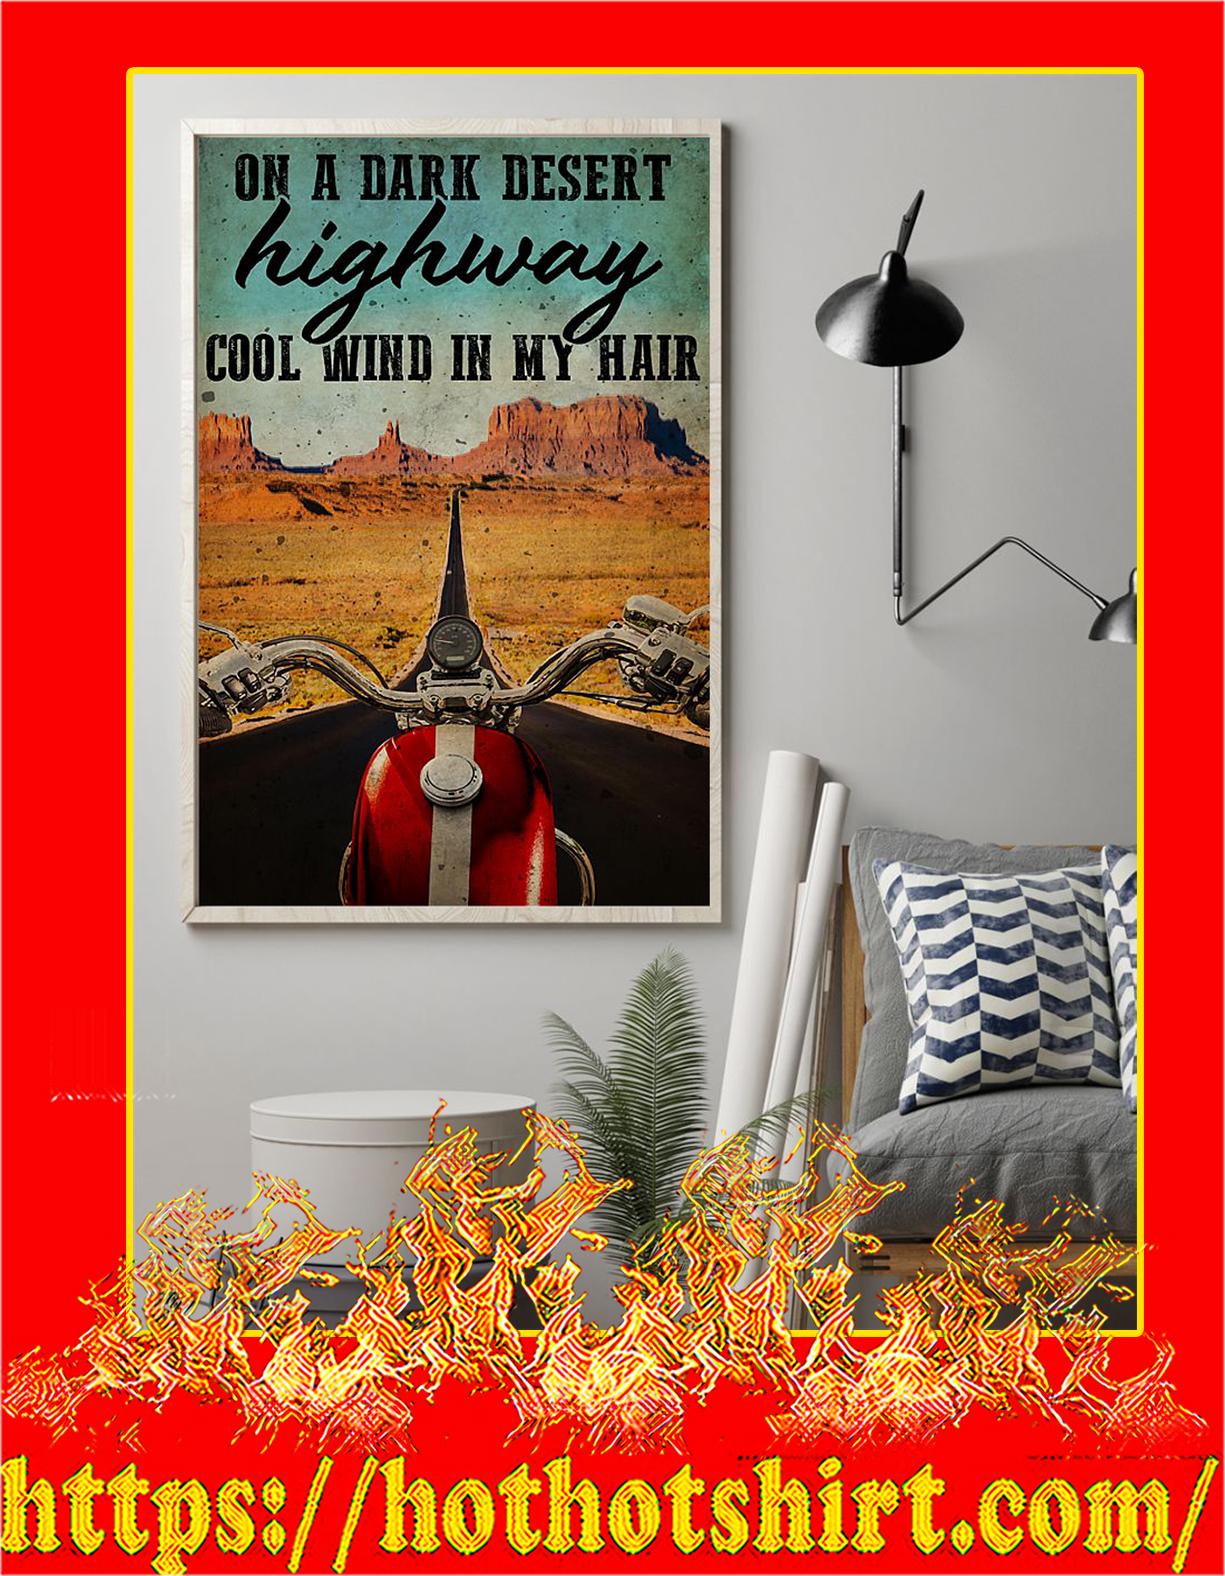 Biker On a dark desert highway cool wind in my hair poster - Pic 1